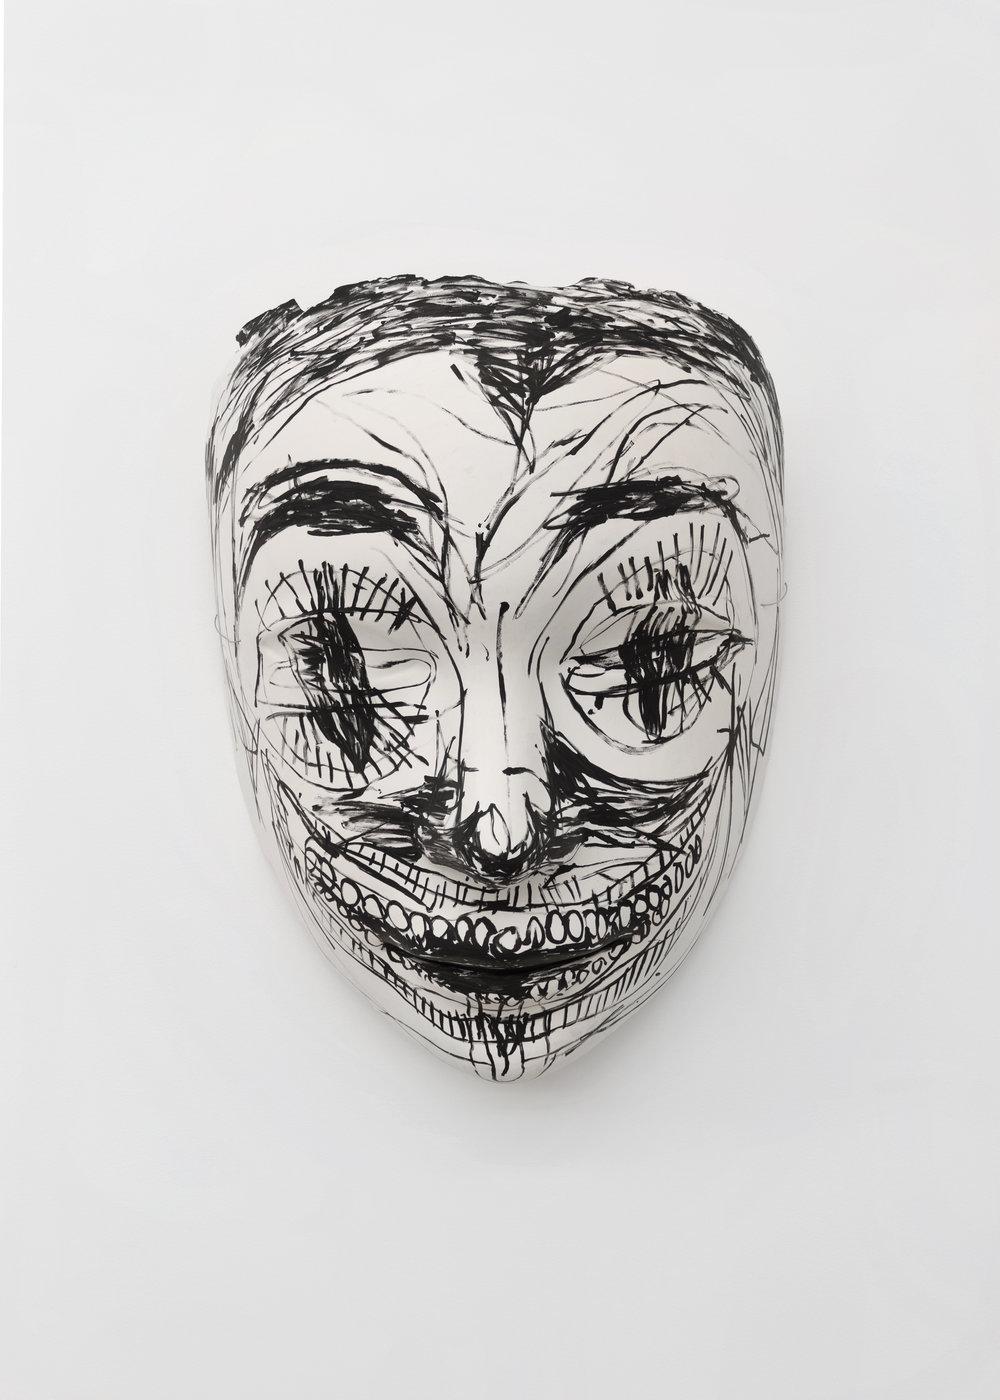 Chloe Siebert,  Mask 2 , 2018, acrylic, fiberglass, latex, and plaster, 42 x 34 x 18 in.